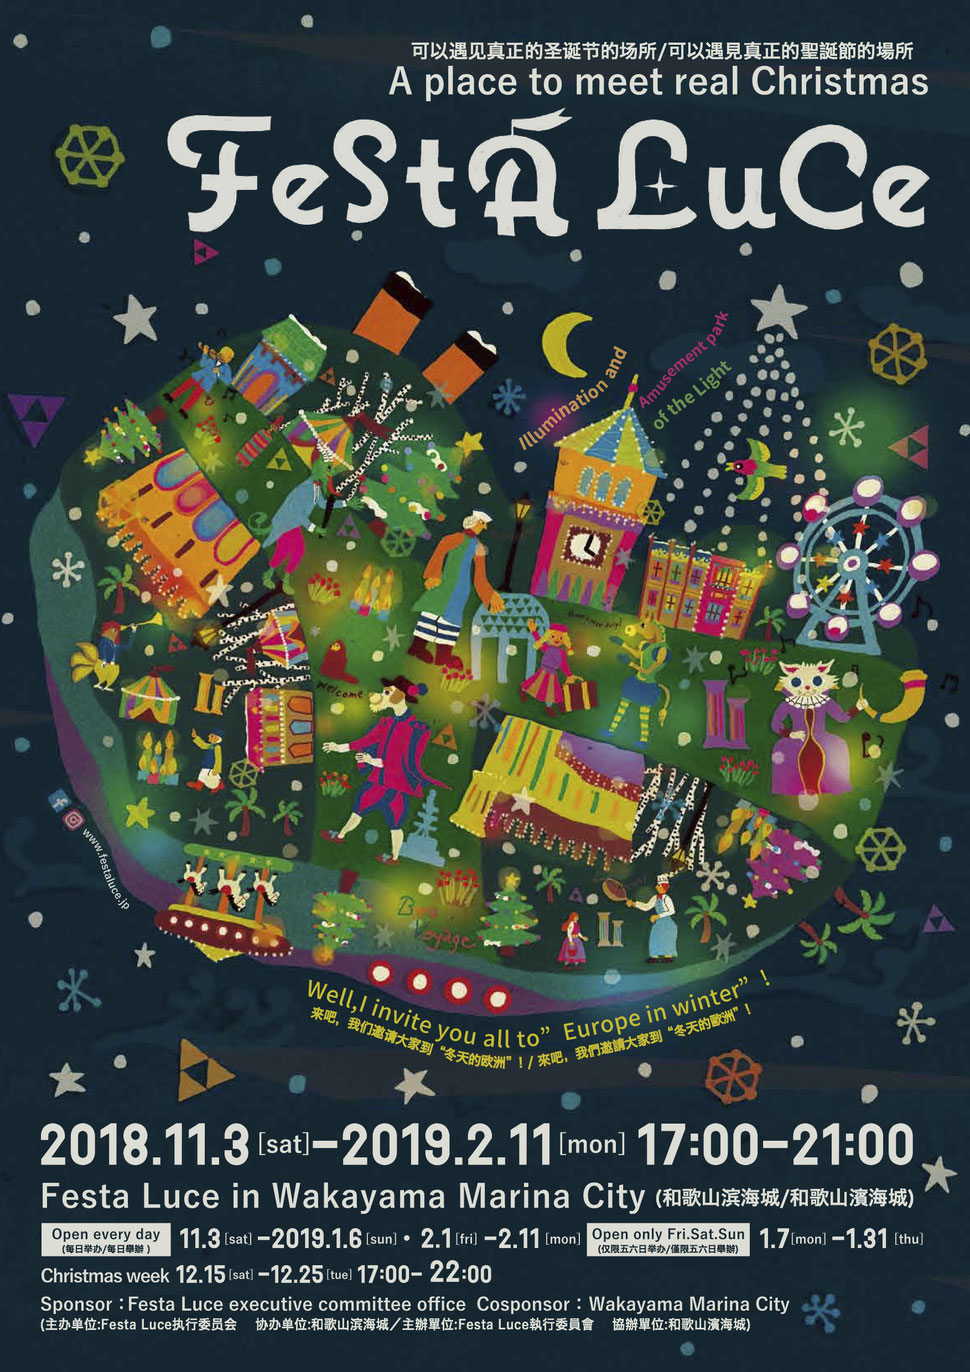 foreign language flyer festaluce イルミネーションイベント